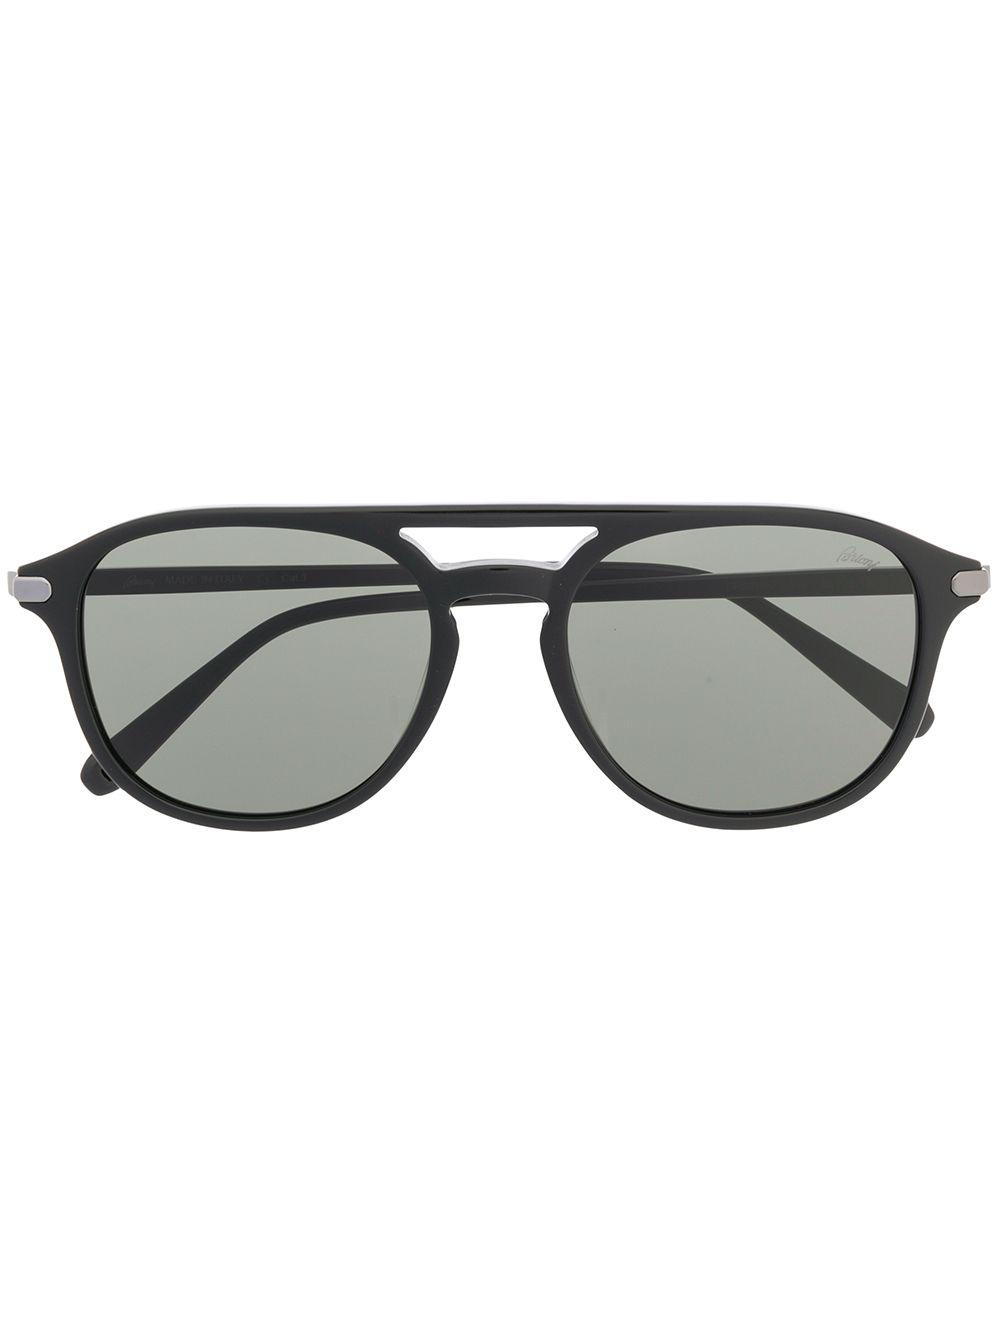 1b8cc0d34774 Brioni Square Sunglasses - Black   ModeSens